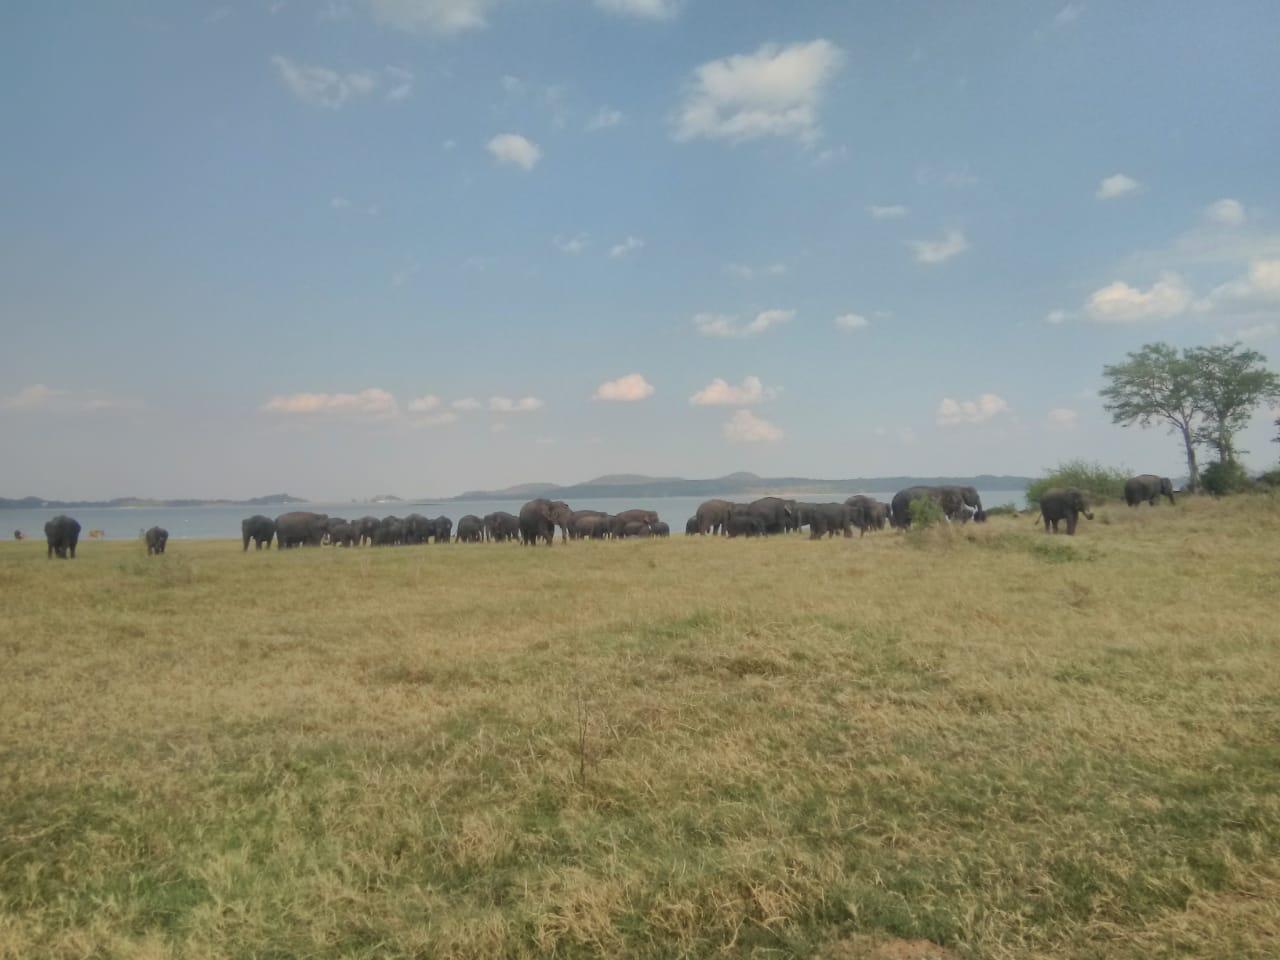 invite-to-paradise-sri-lanka-holiday-honeymoon-specialists-customer-feedback-elin-jordan-luce-wildlife-safari-elephants-1.JPG